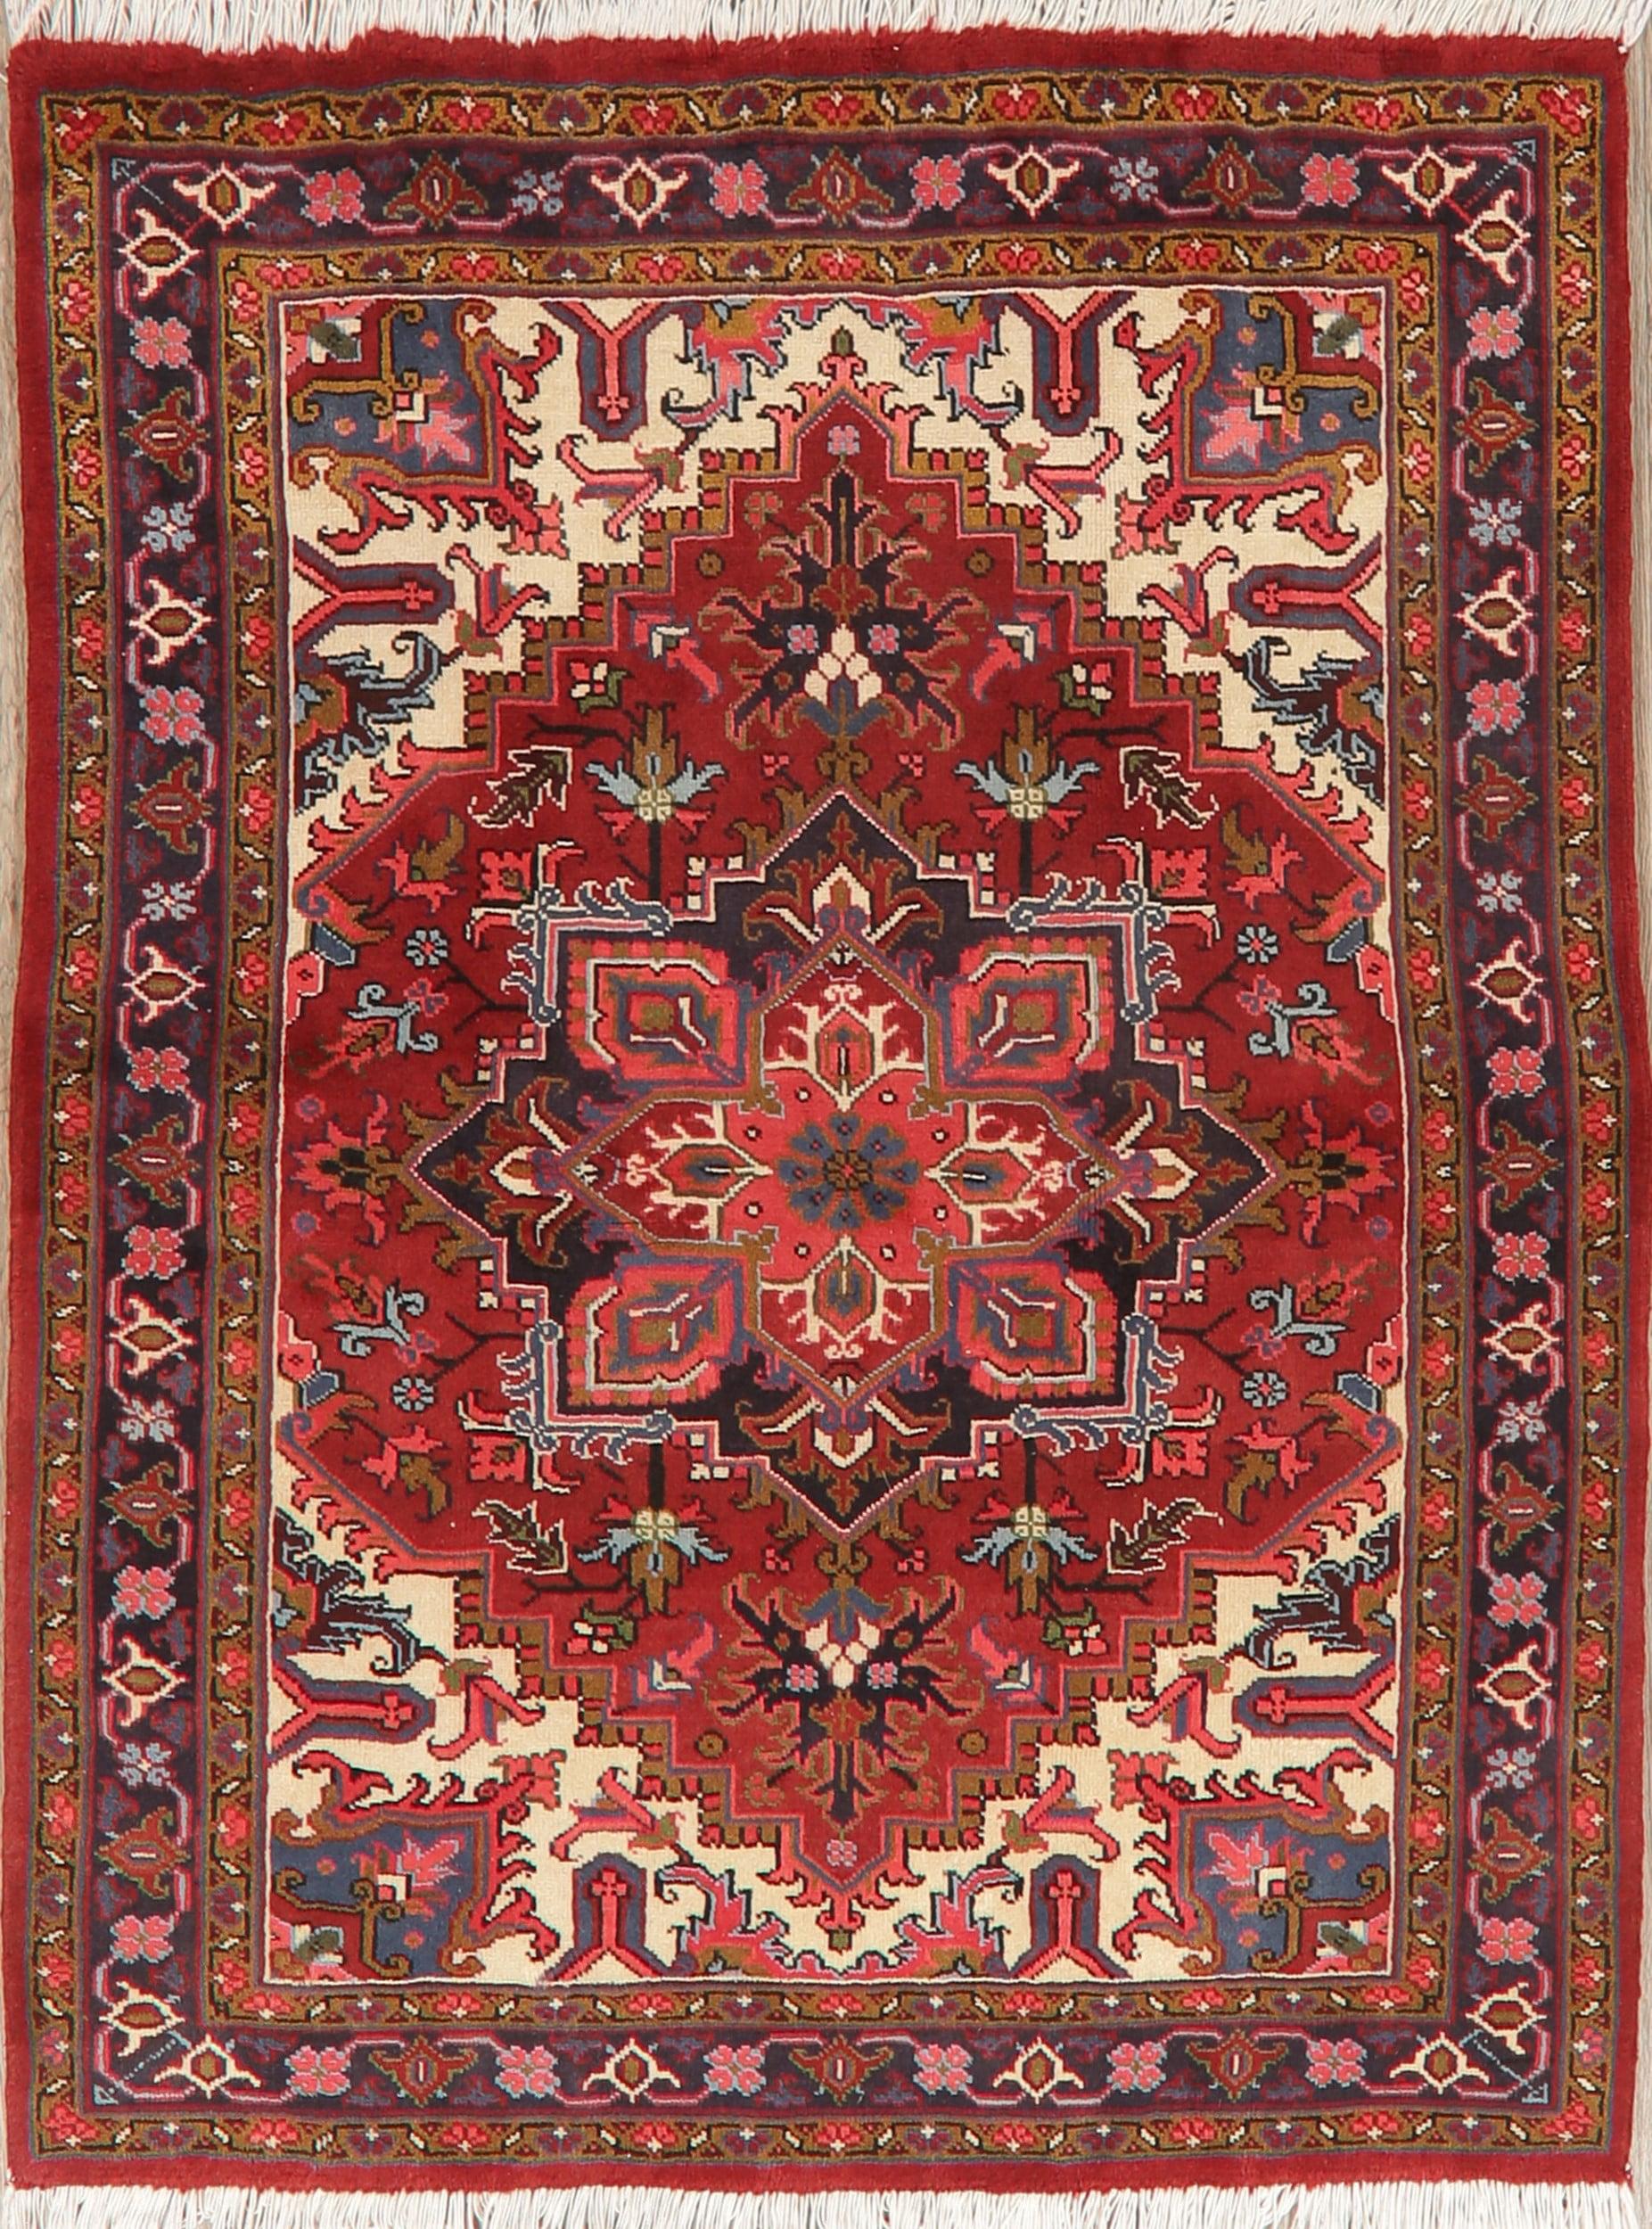 Red Navy Blue Geometric Red Oriental Handmade Area Rug Living Room Wool Carpet 5x6 Walmart Com Walmart Com